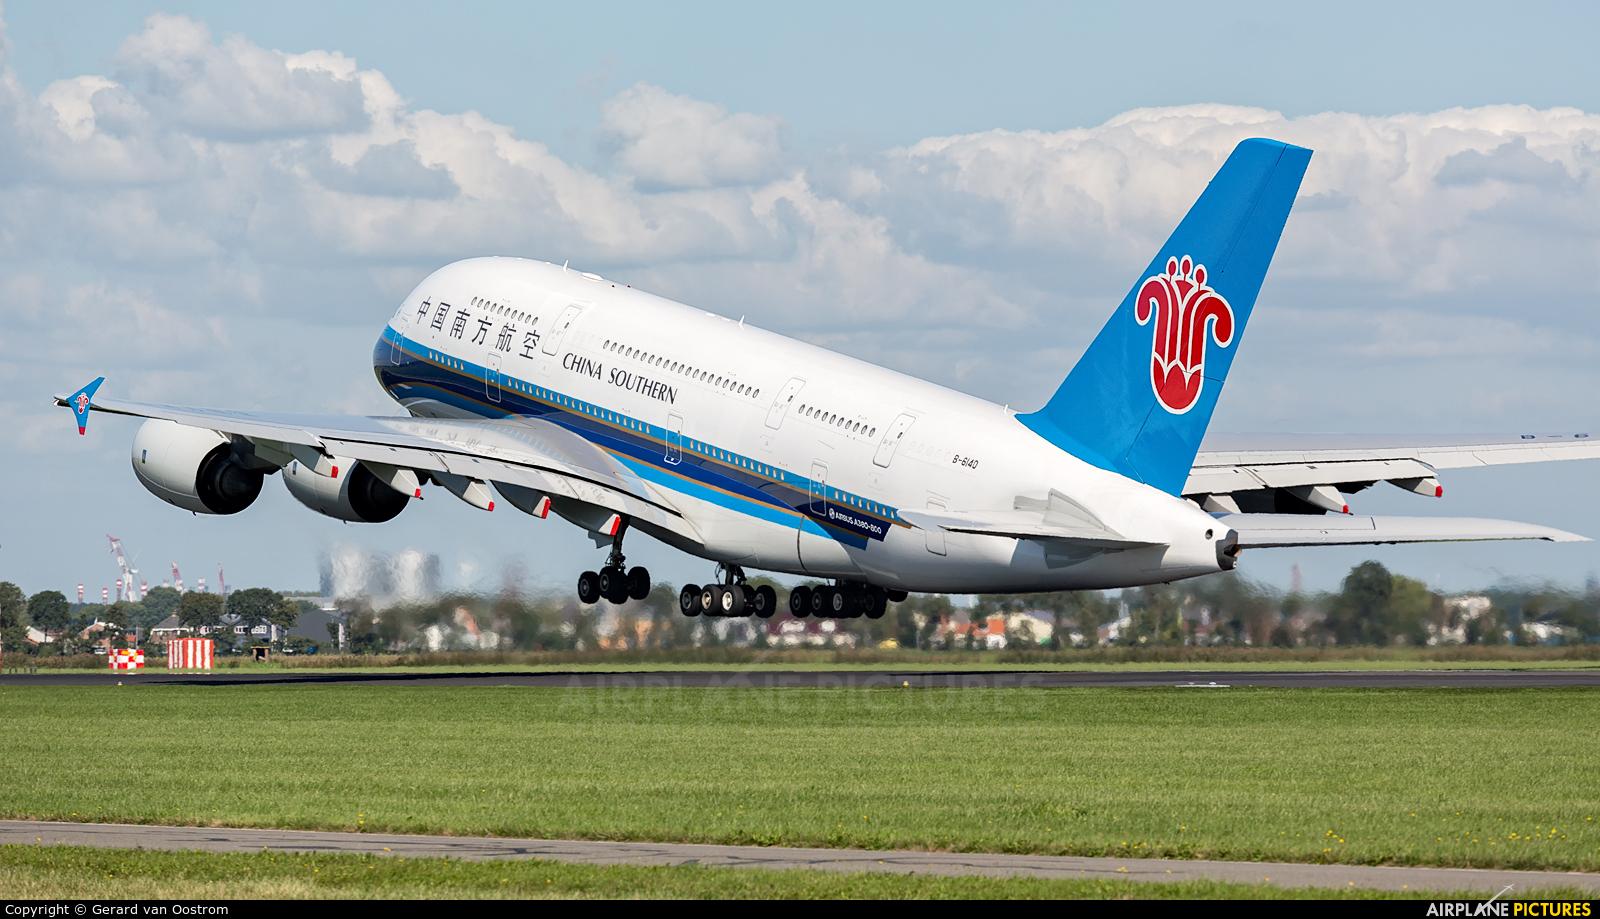 China Southern Airlines B-6140 aircraft at Amsterdam - Schiphol